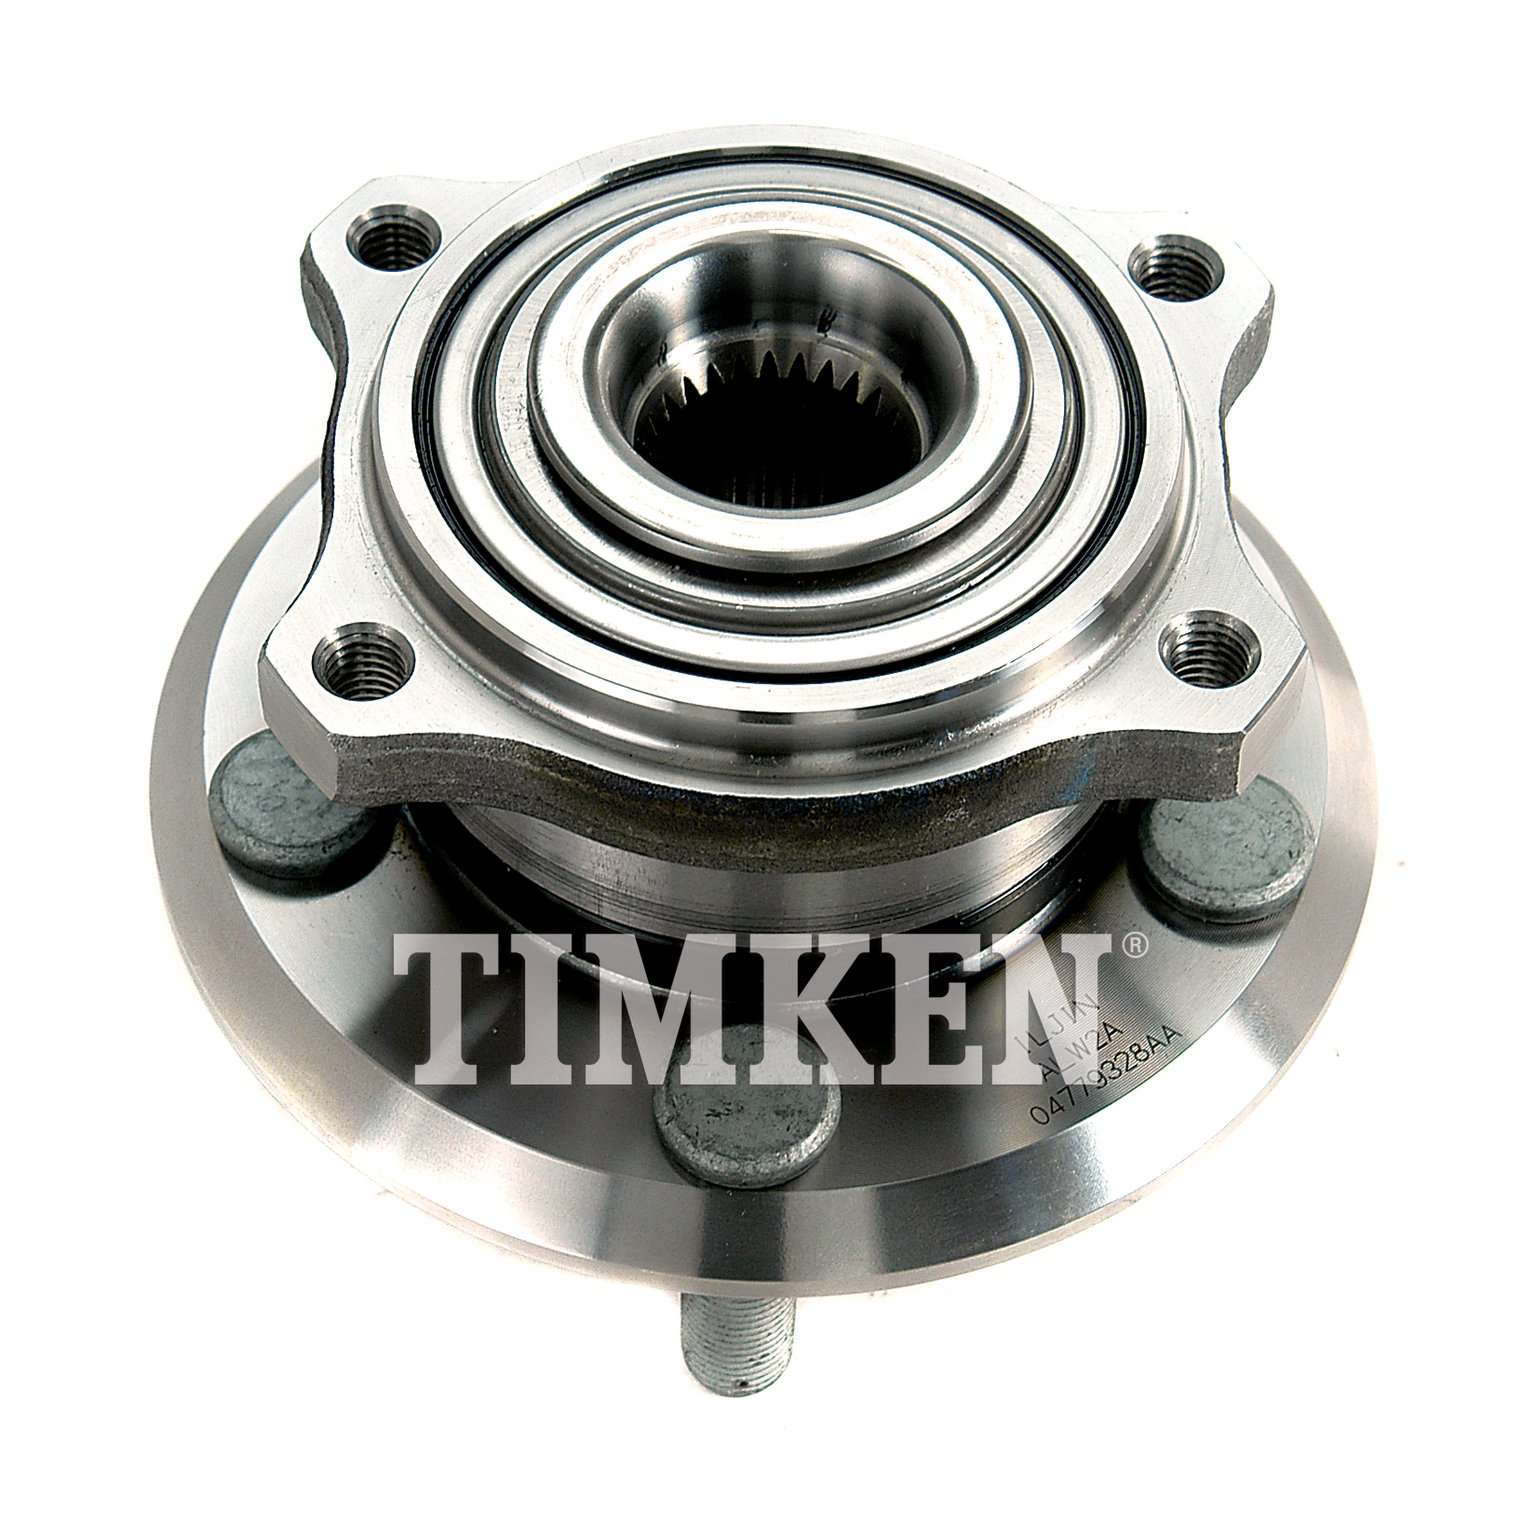 2007 dodge charger axle bearing and hub assembly timken bearing ha590142